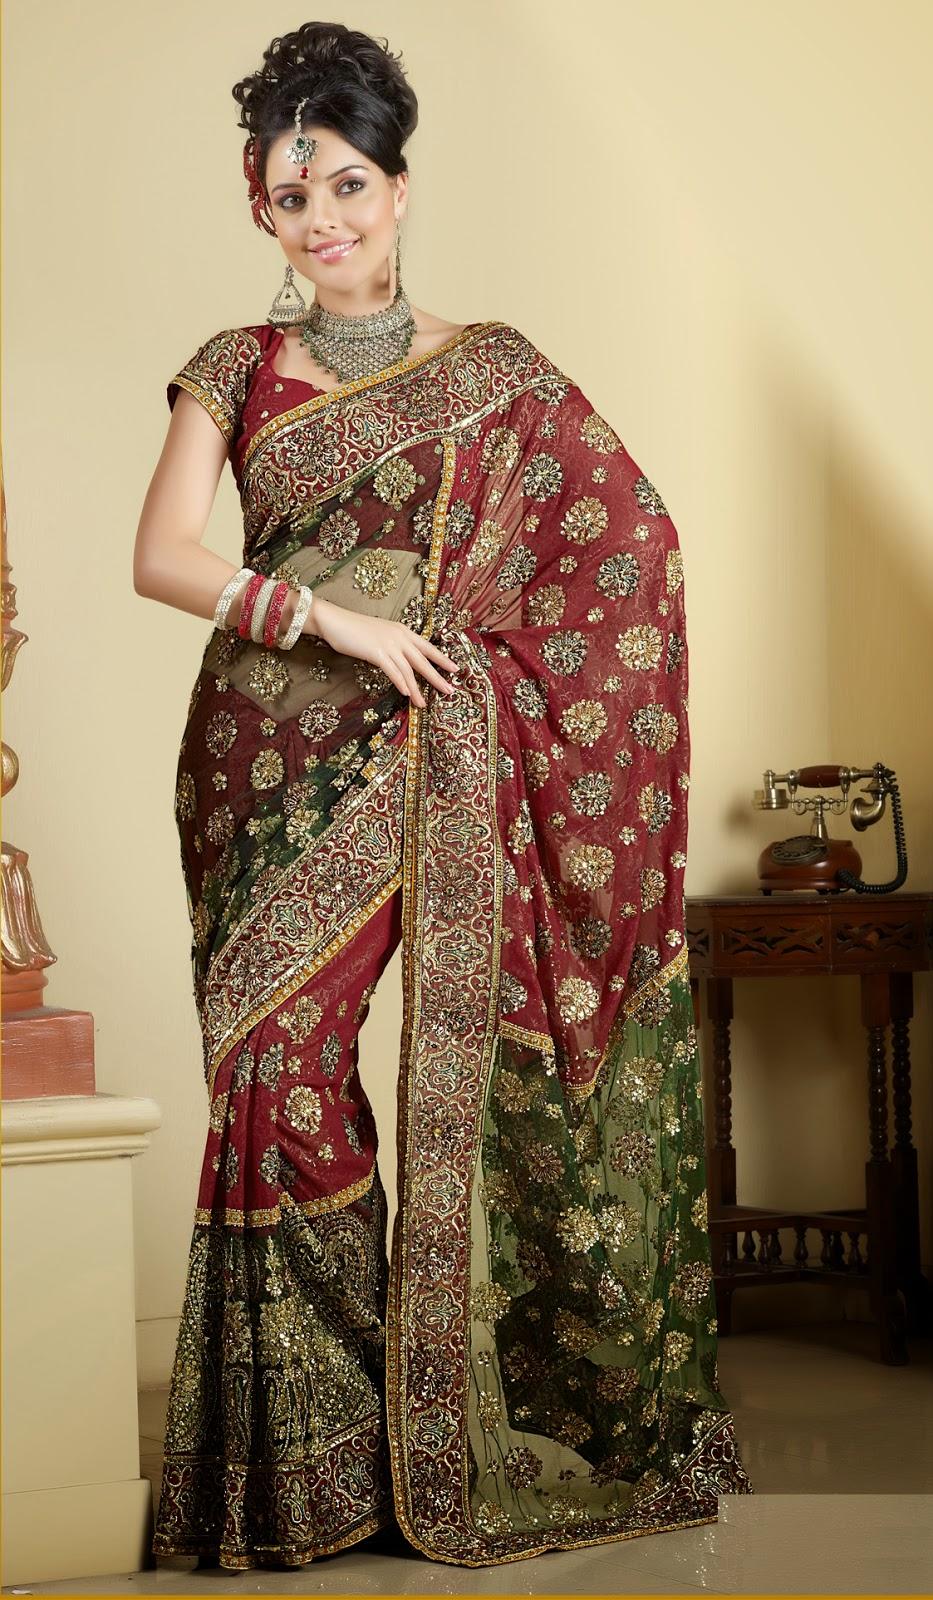 Indian Desi Females In Saree Full Hd  Photo Chocolate-3193